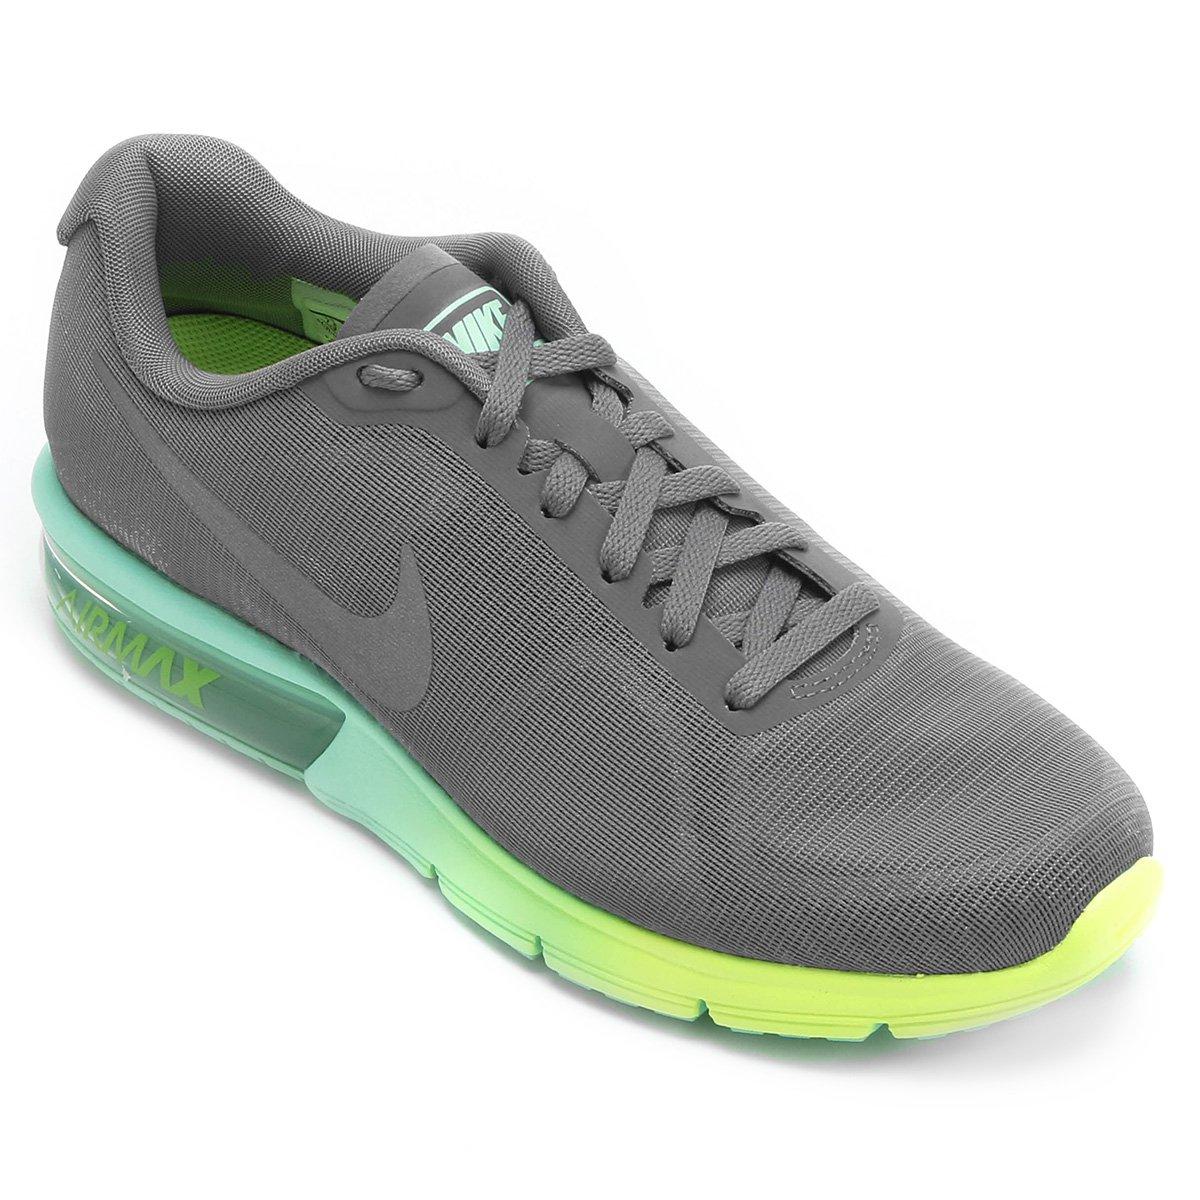 ff87773f3c0b2 Tênis Nike Air Max Sequent Feminino | Loja do Inter